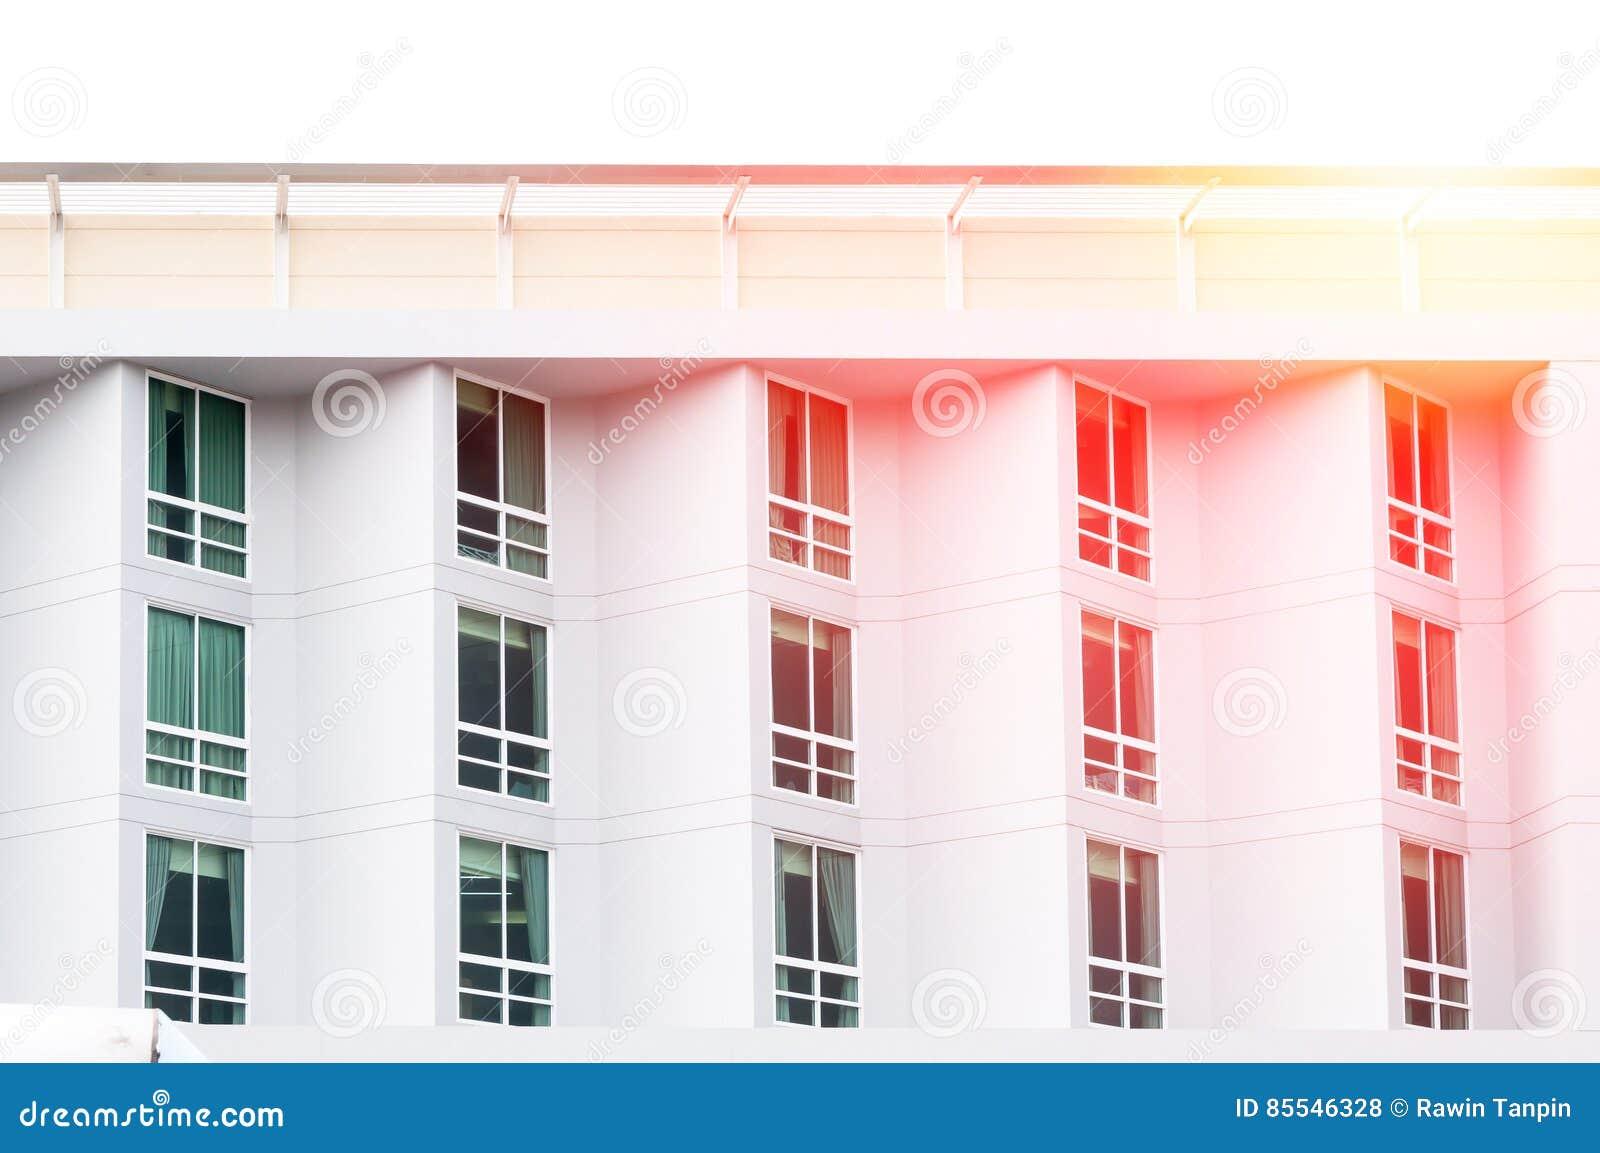 Condominium window glass modern,modern building with large windows